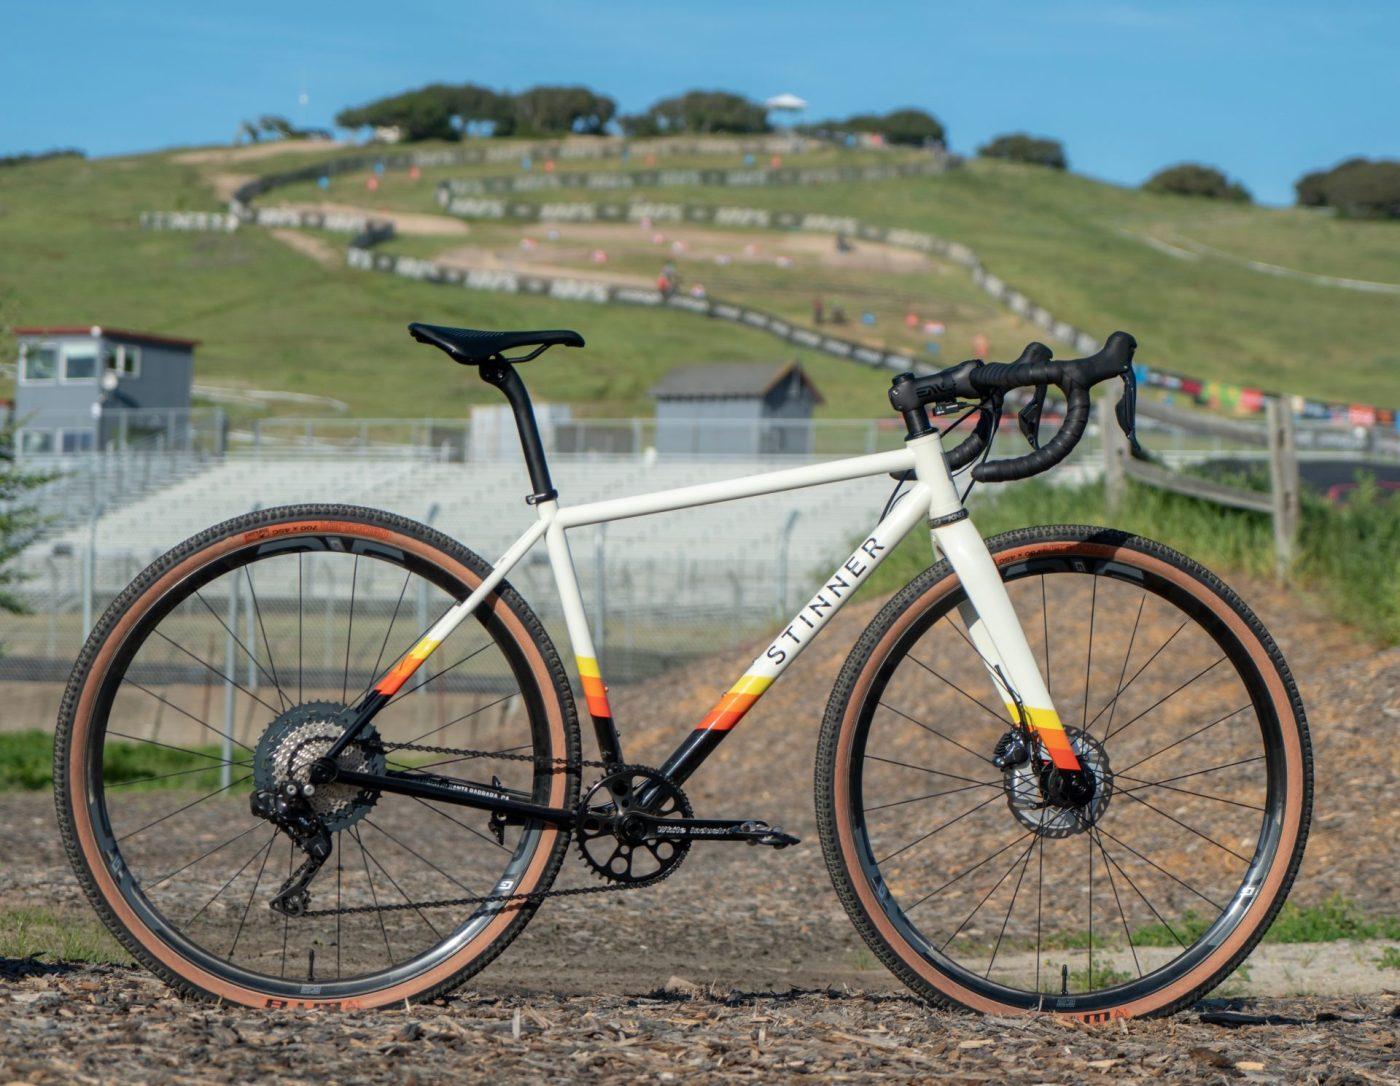 Builders For Builders: Dream Bike Raffle Benefiting Sierra Trails 3